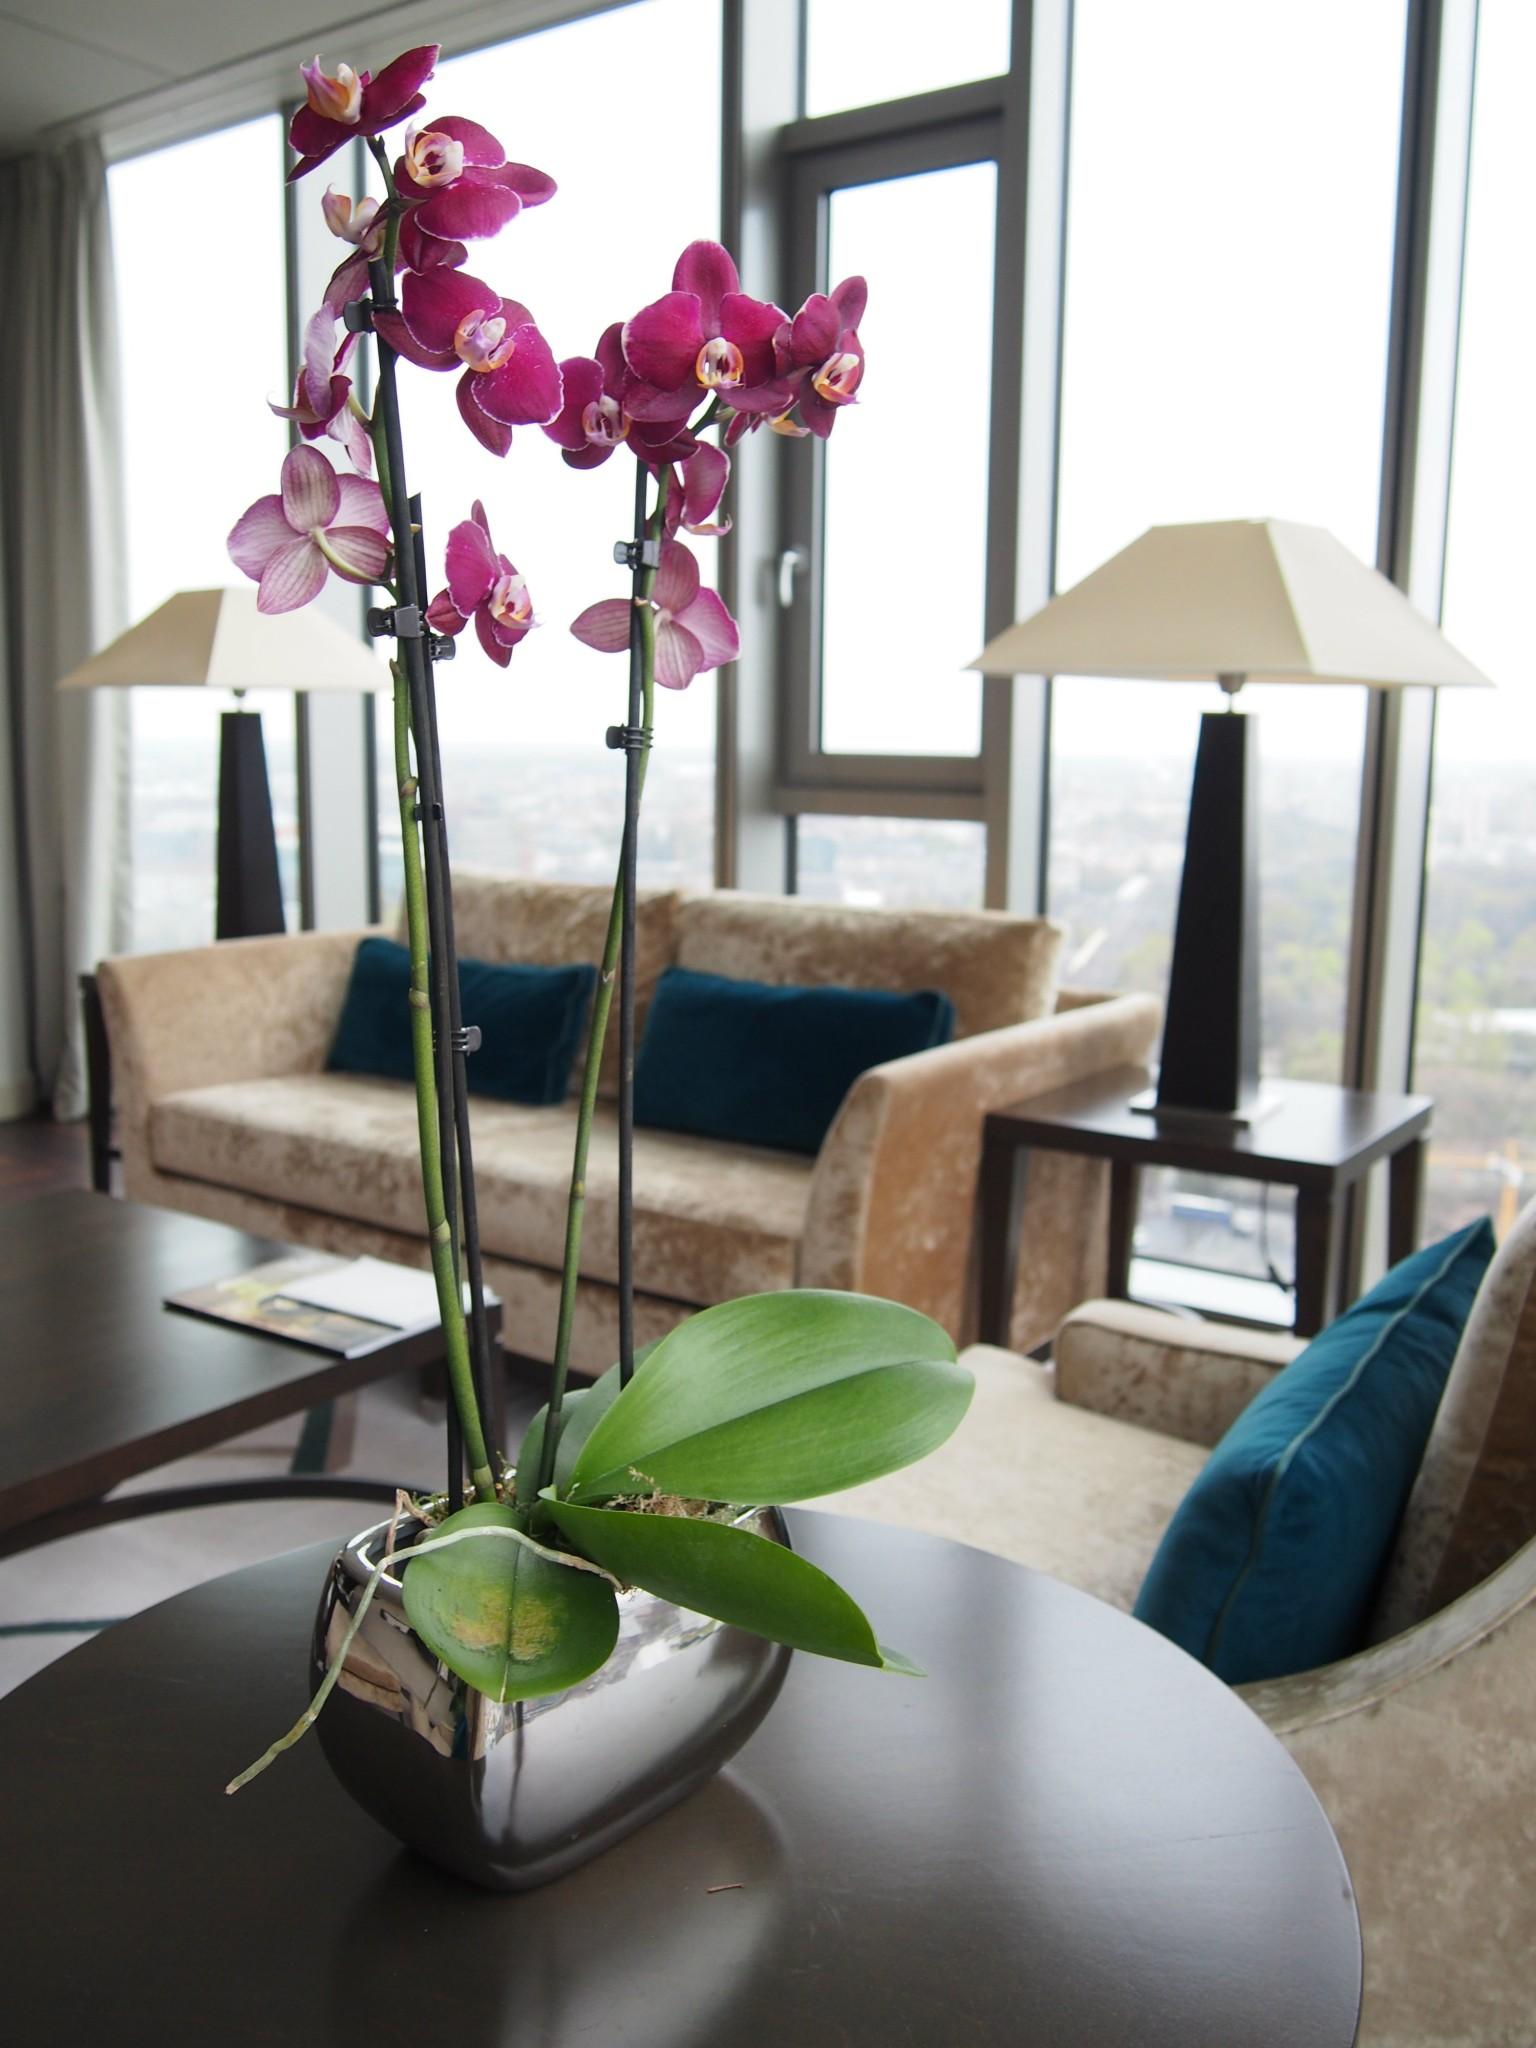 Waldorf Astoria Berlin Tower Suite olohuone 5